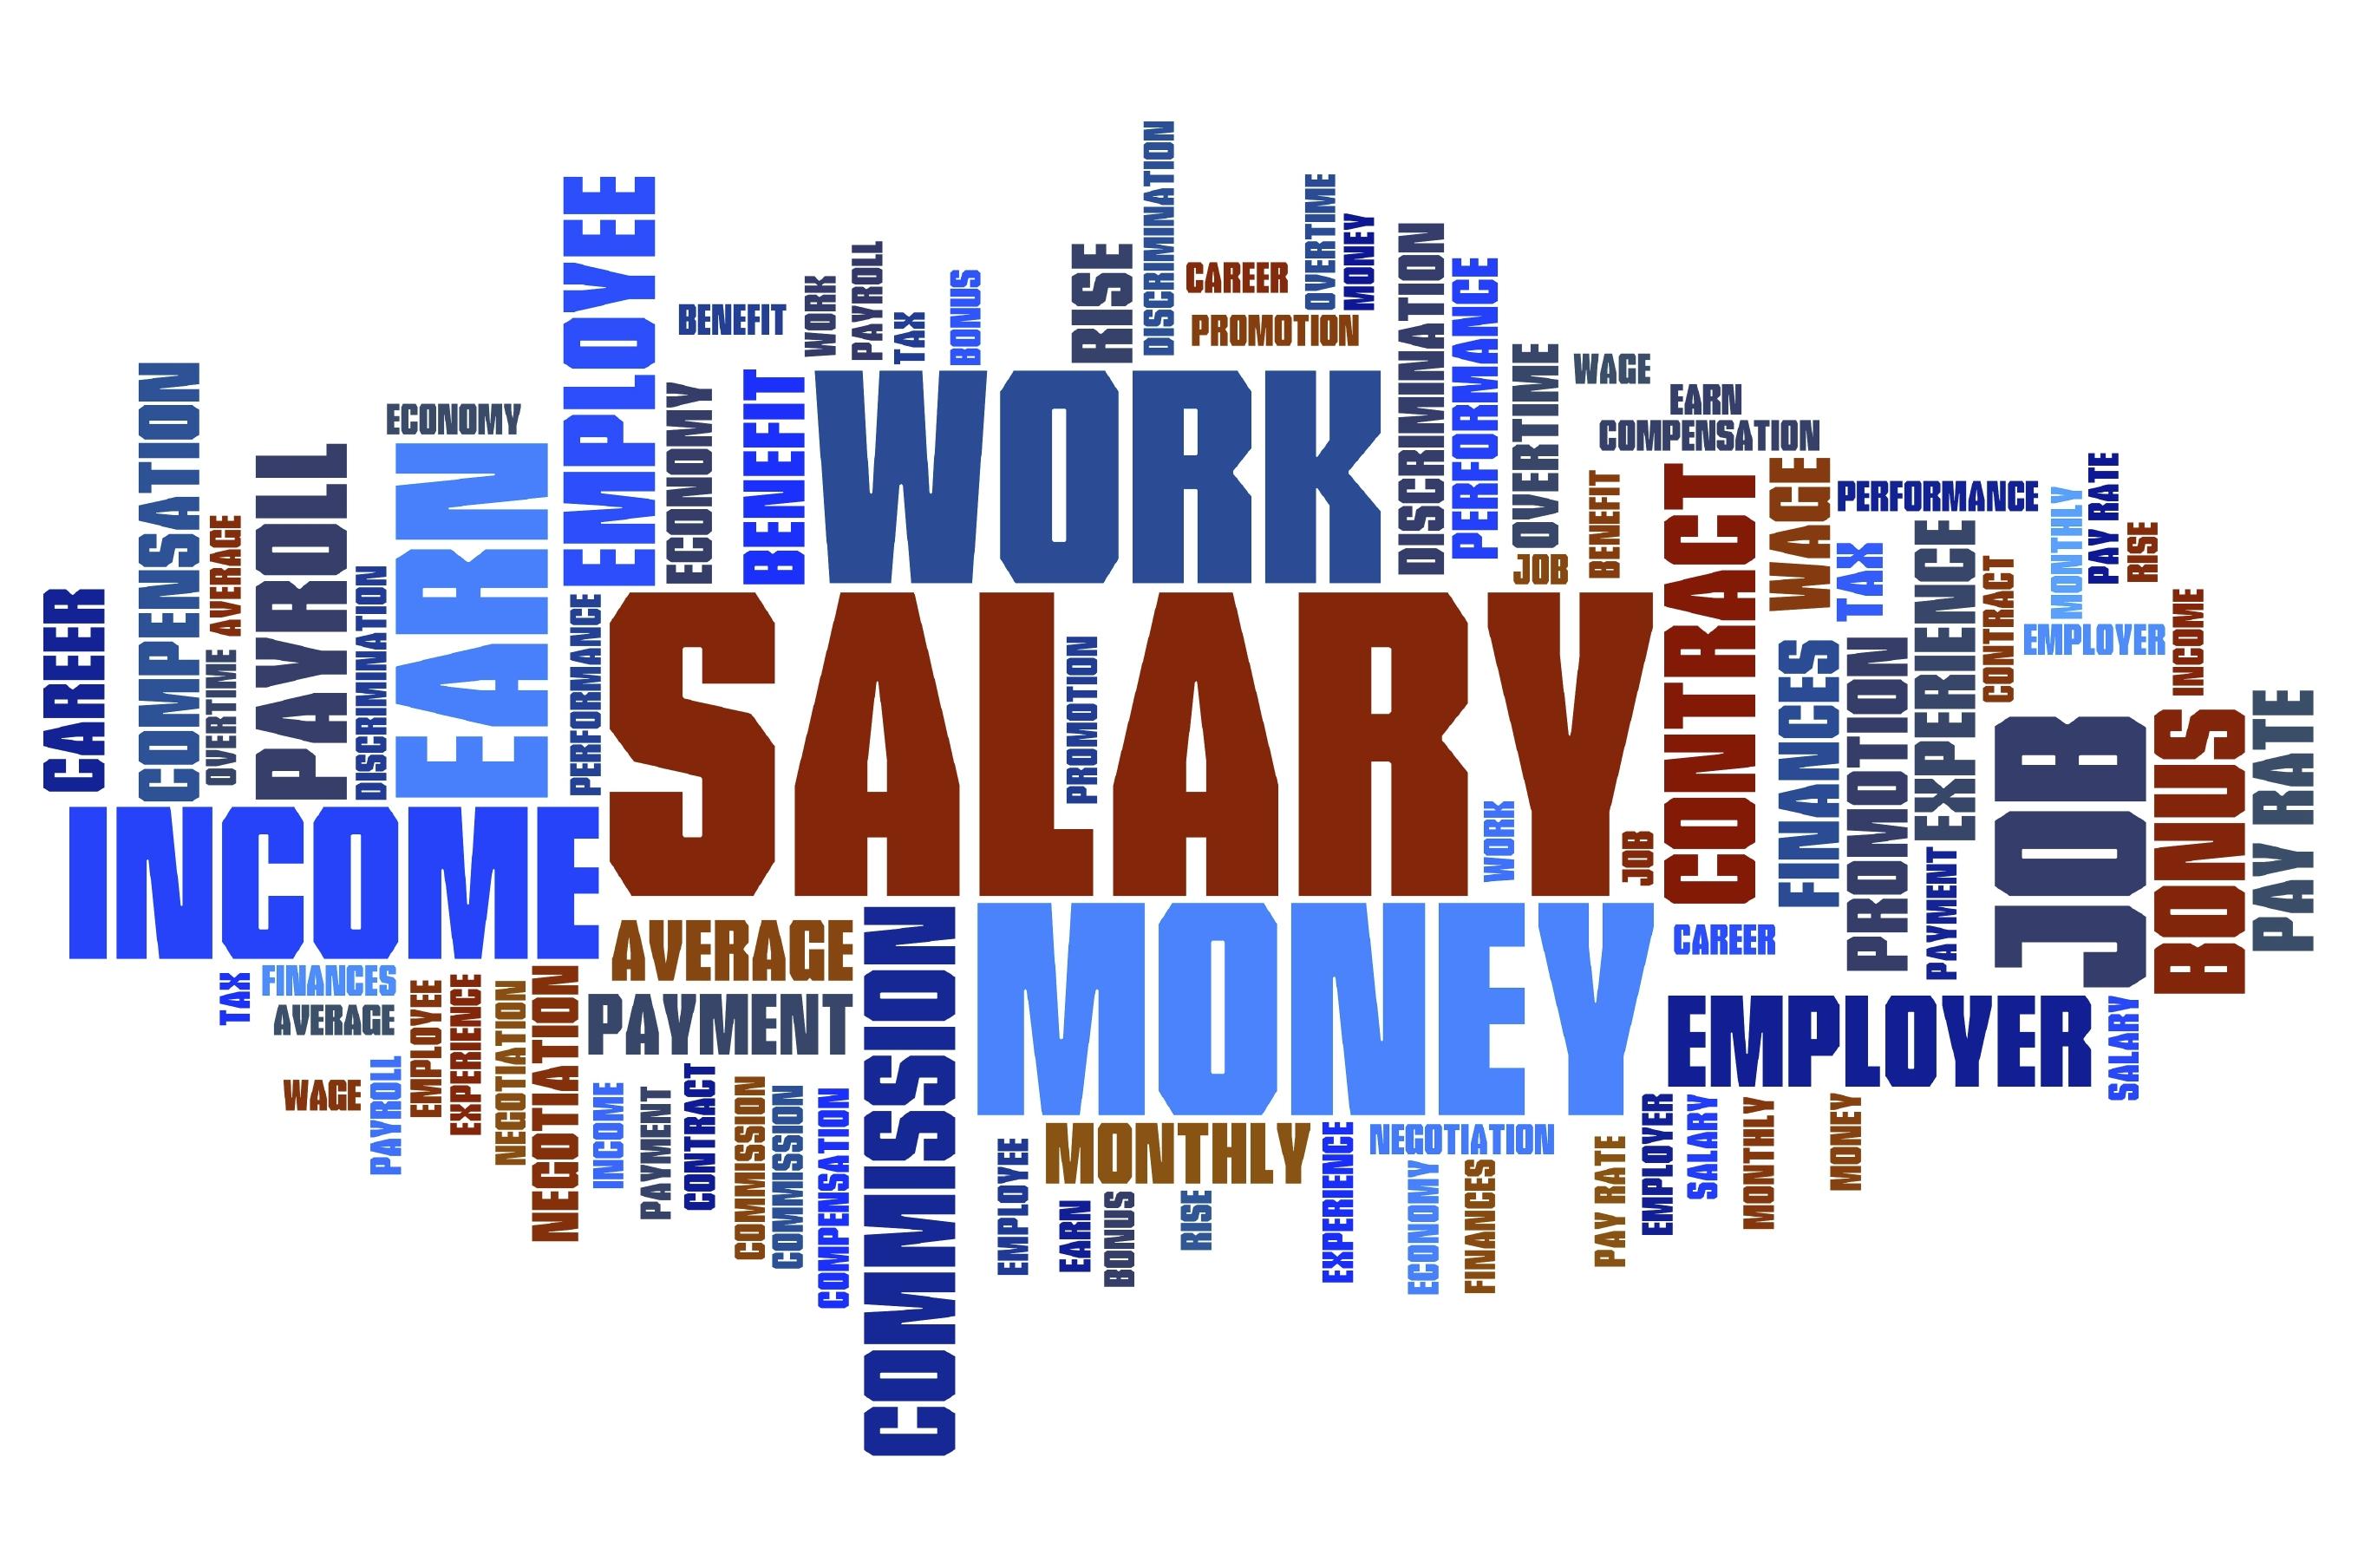 Salary Information Baton Rouge Career Center